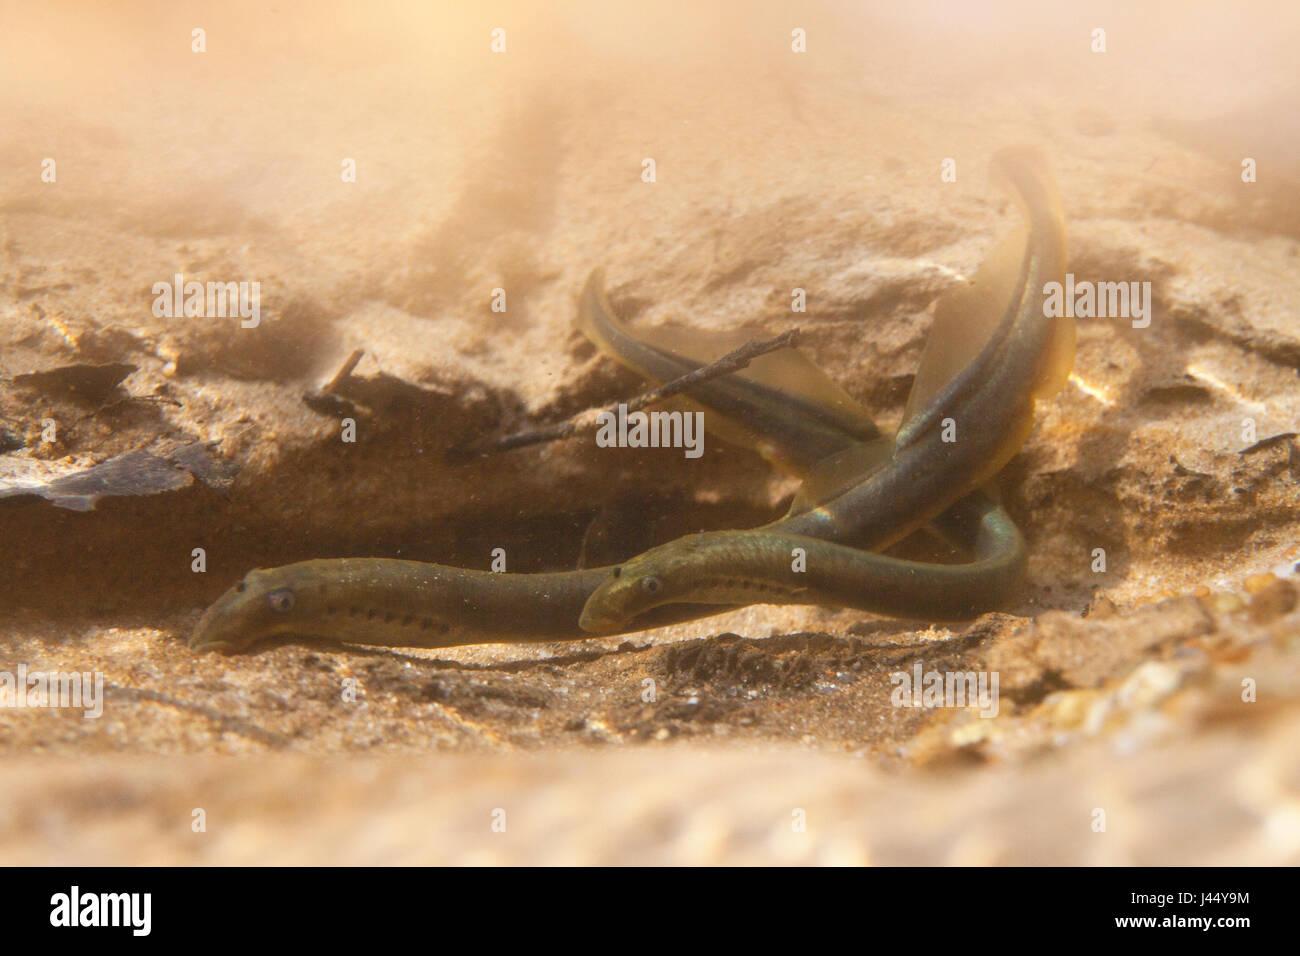 spawning brook lampreys - Stock Image